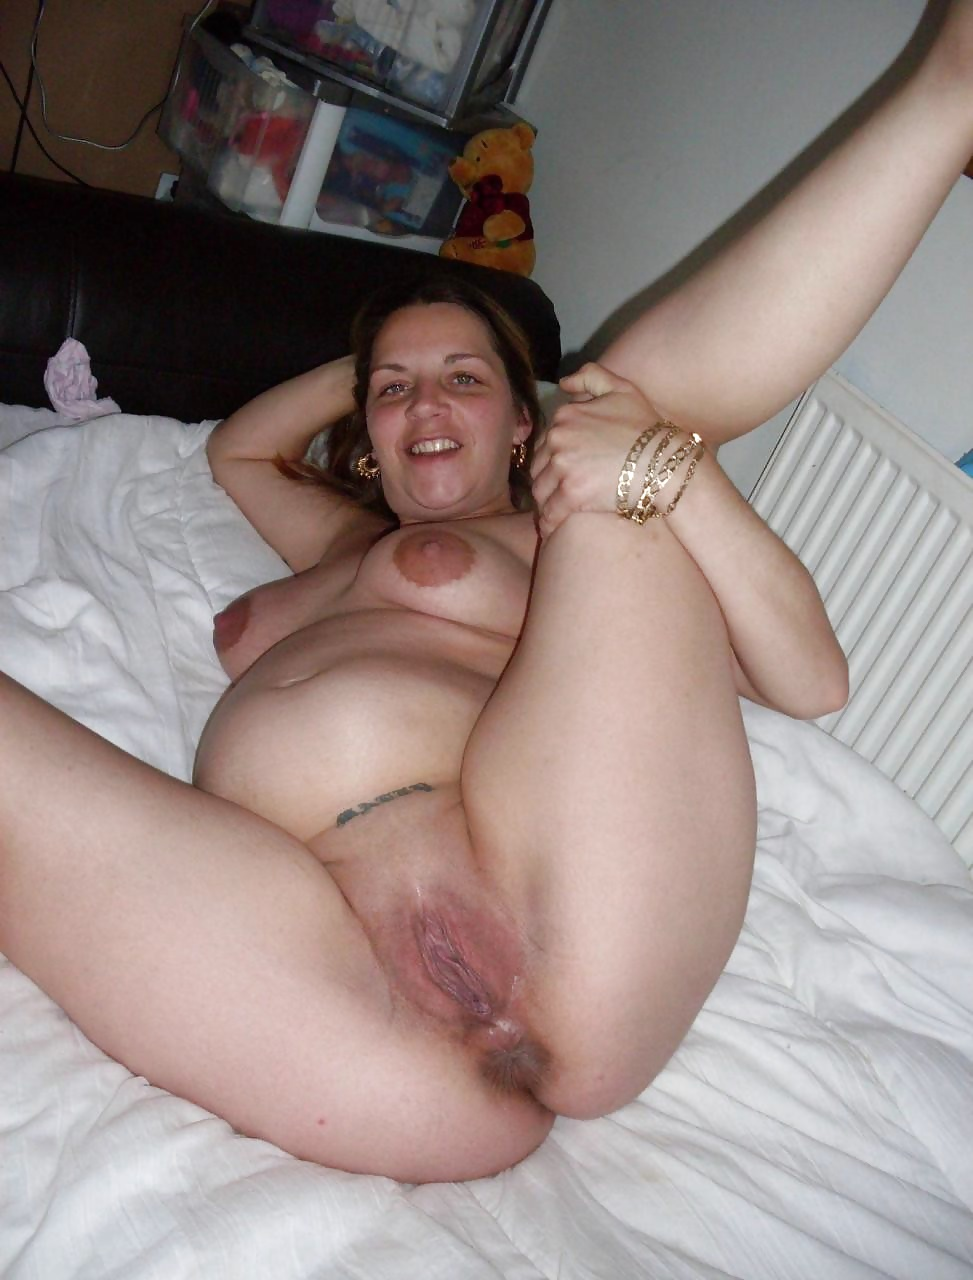 ameteur-naked-pregnant-pussy-divx-adult-movie